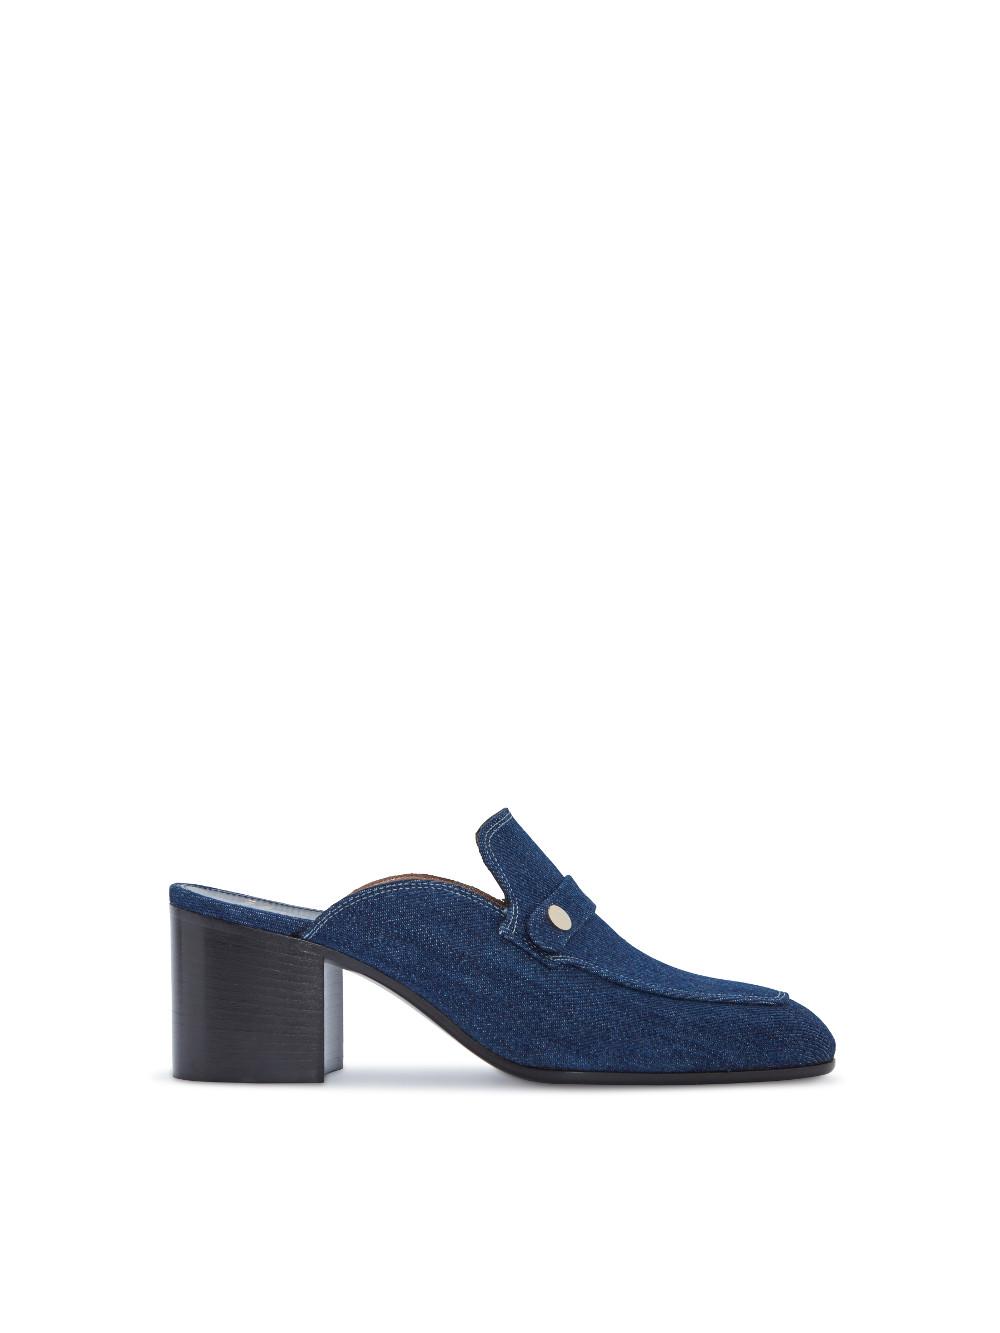 LD_PF18_Thelma_Jeans Blue_5487.jpg